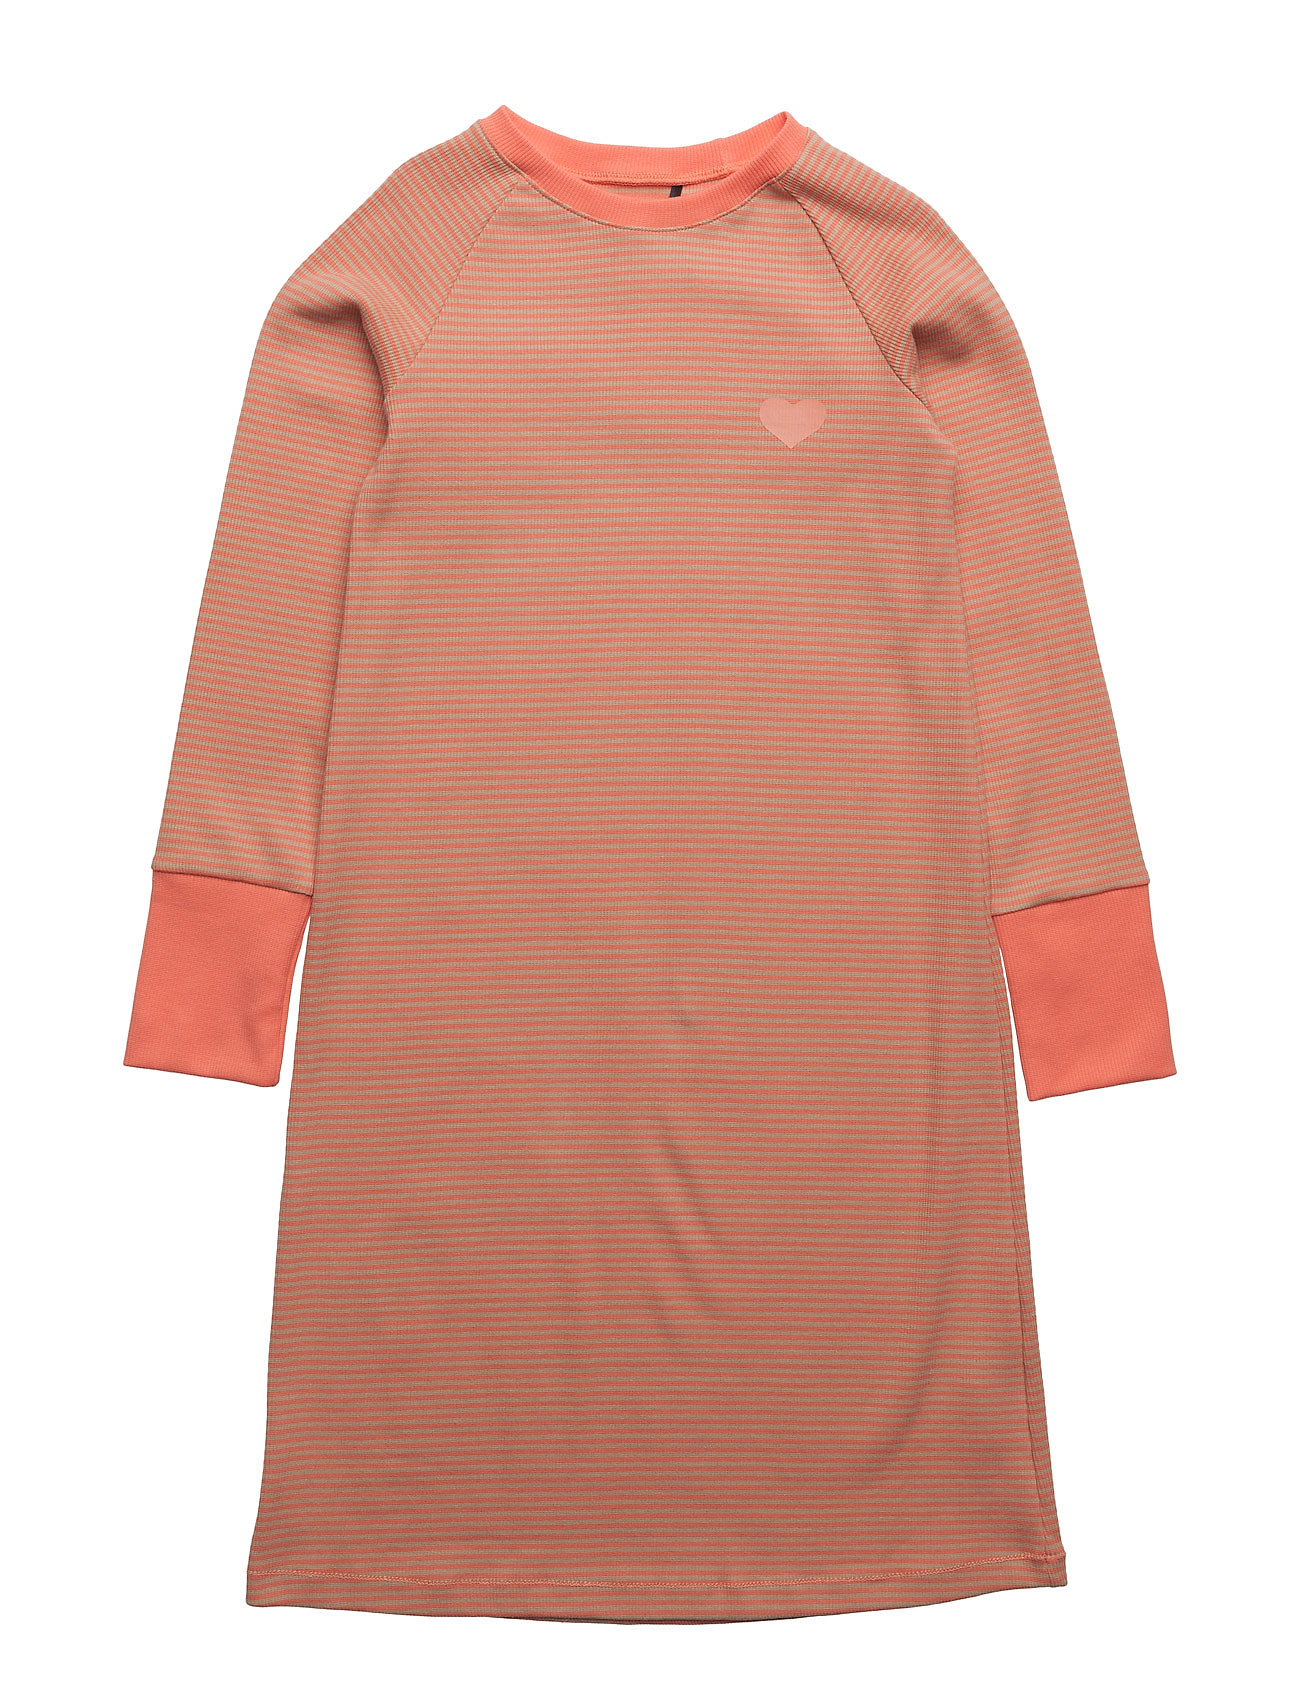 albababy Lea school dress på boozt.com dk